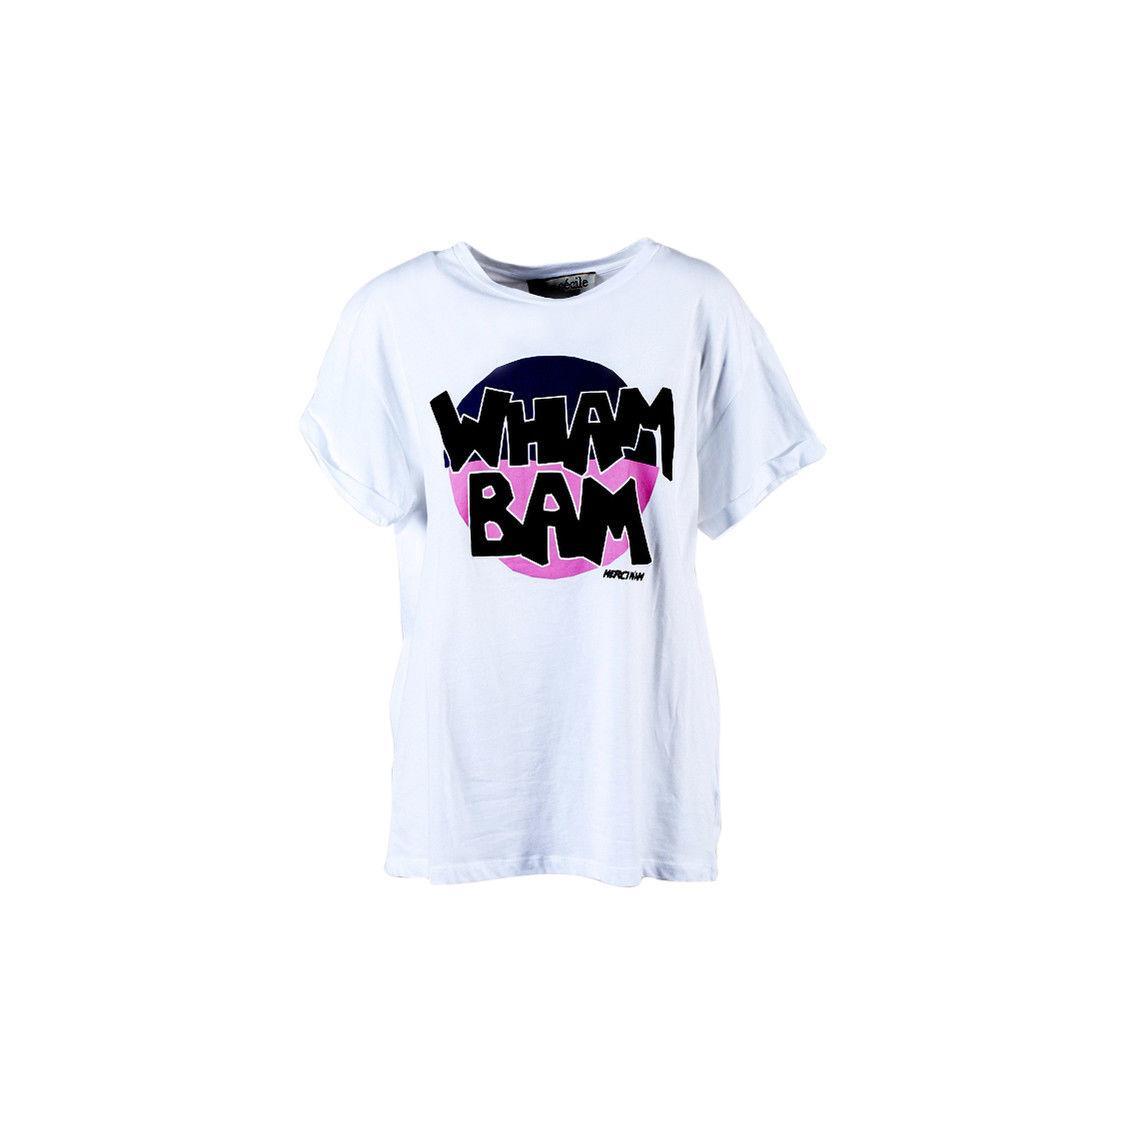 b9d1edd59e Etre Cecile NWT White Multicolor Cotton Wham Bam T Shirt SZ M Custom t  shirt logo text photo Mens Womens T-shirt men tshirt rock